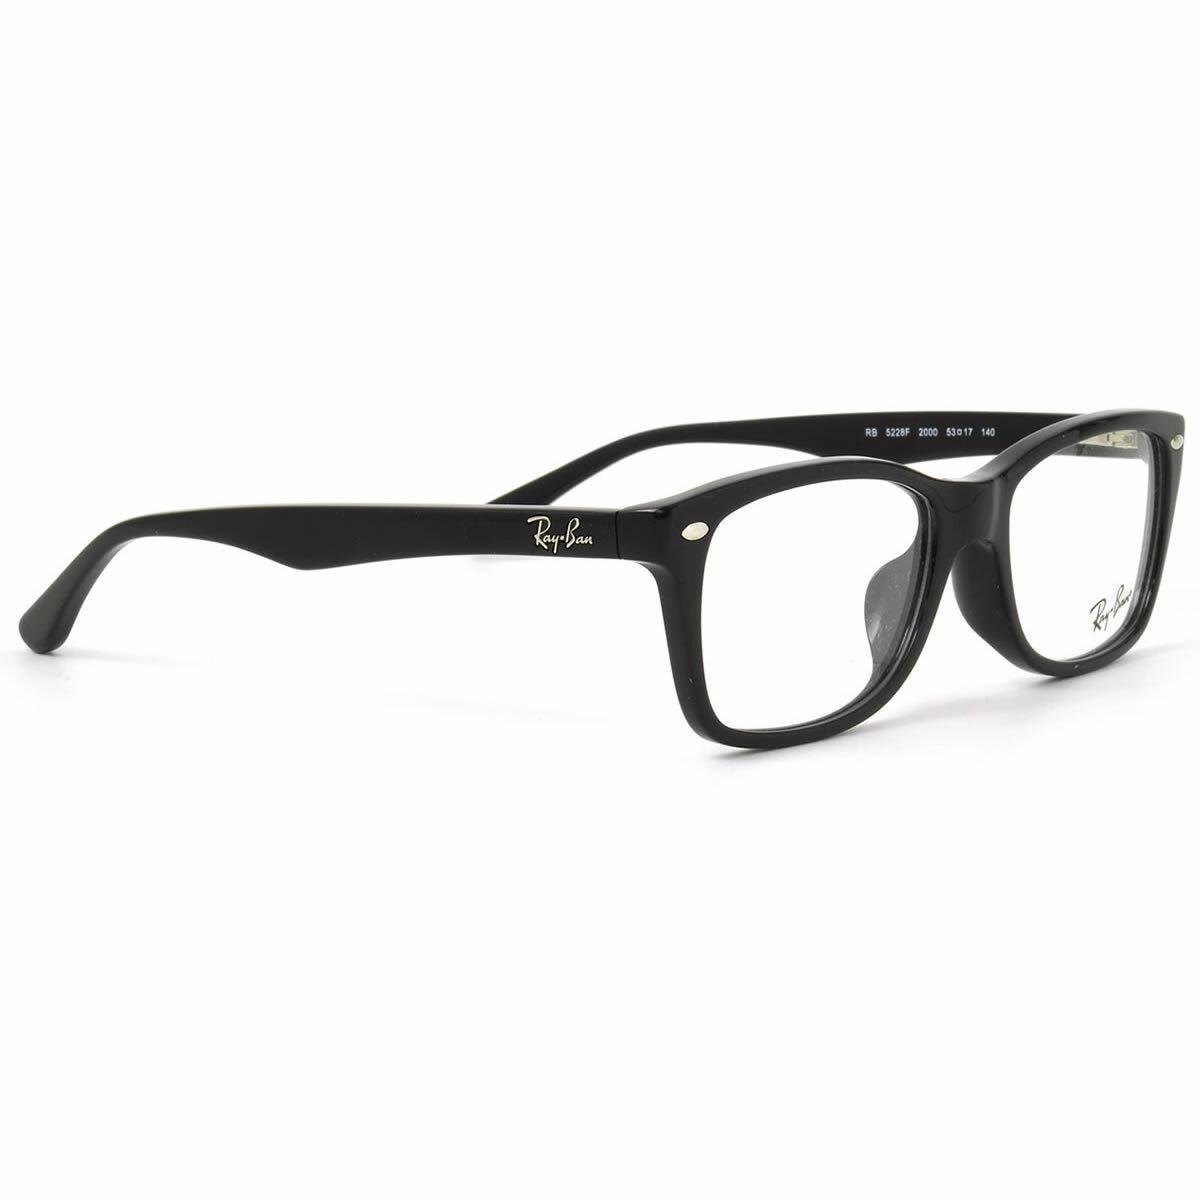 1ed76947f669 Korean Rayban Eyeglass Price In Nepal